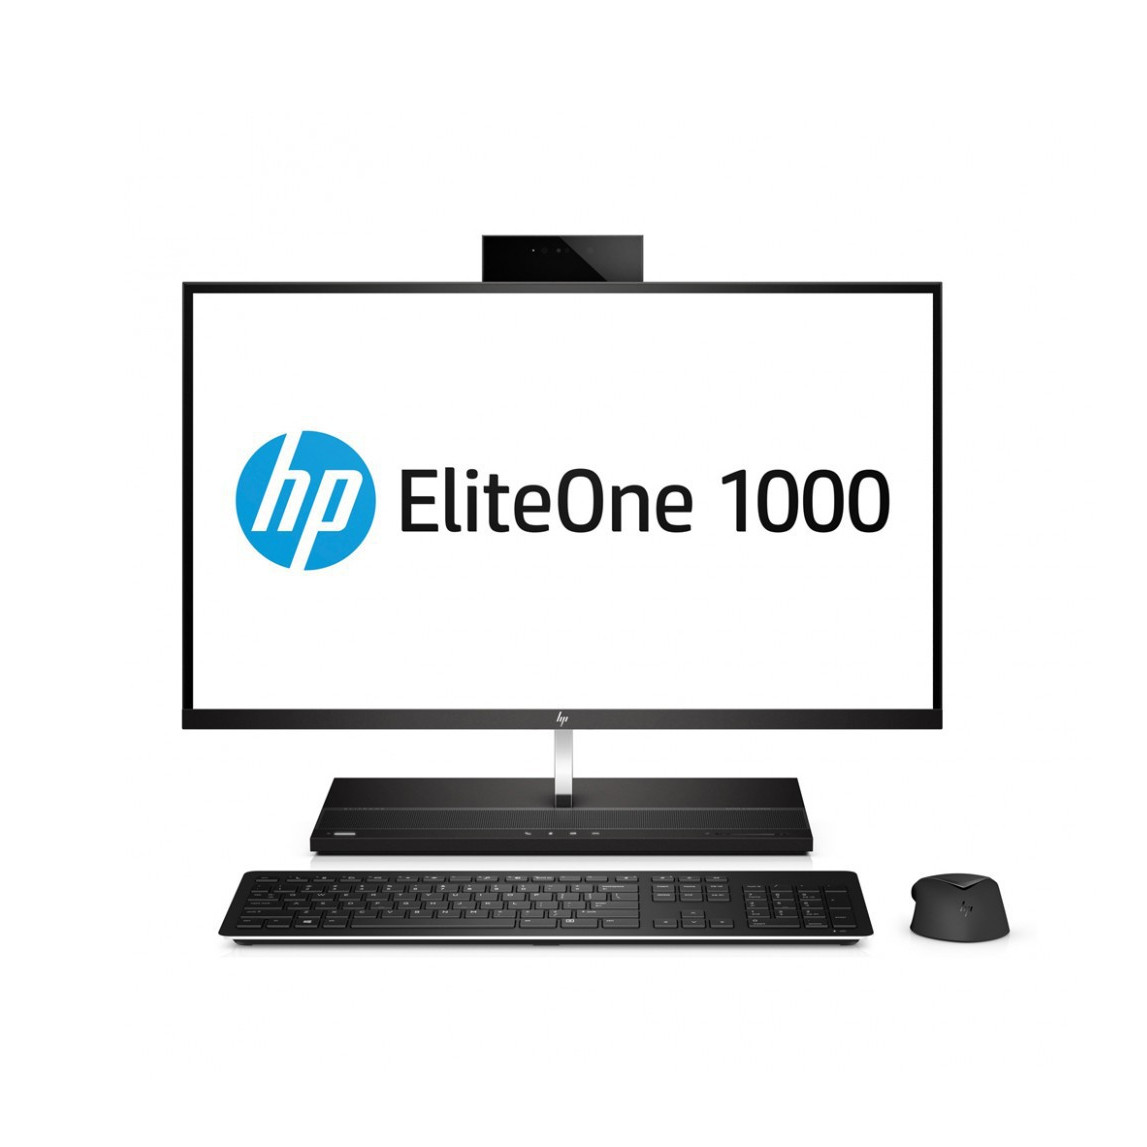 Моноблок HP EliteOne 1000 G2 Intel Core i5 6 ядер 8 Гб SSD 256 Гб Windows 10 Pro 4PD29EA